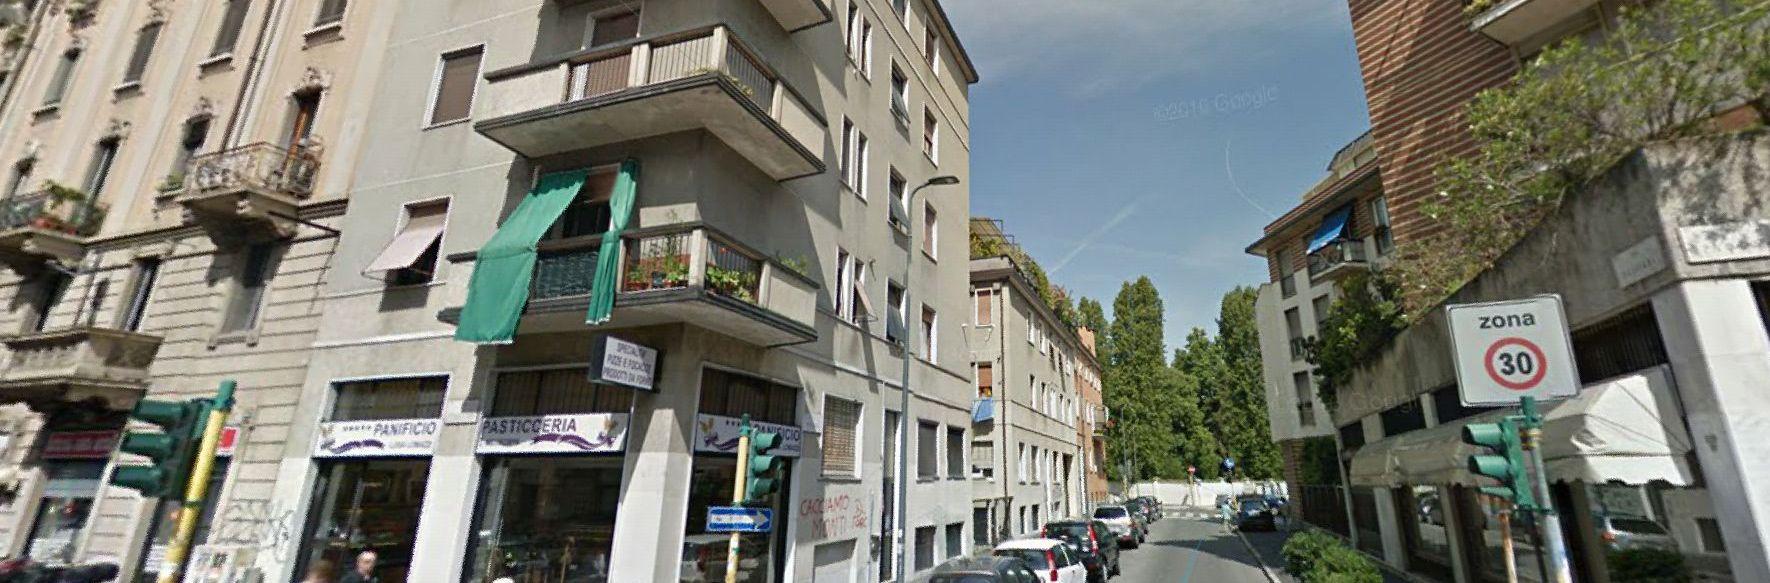 Milano | Appartamento in Vendita in Via Padova | lacasadimilano.it